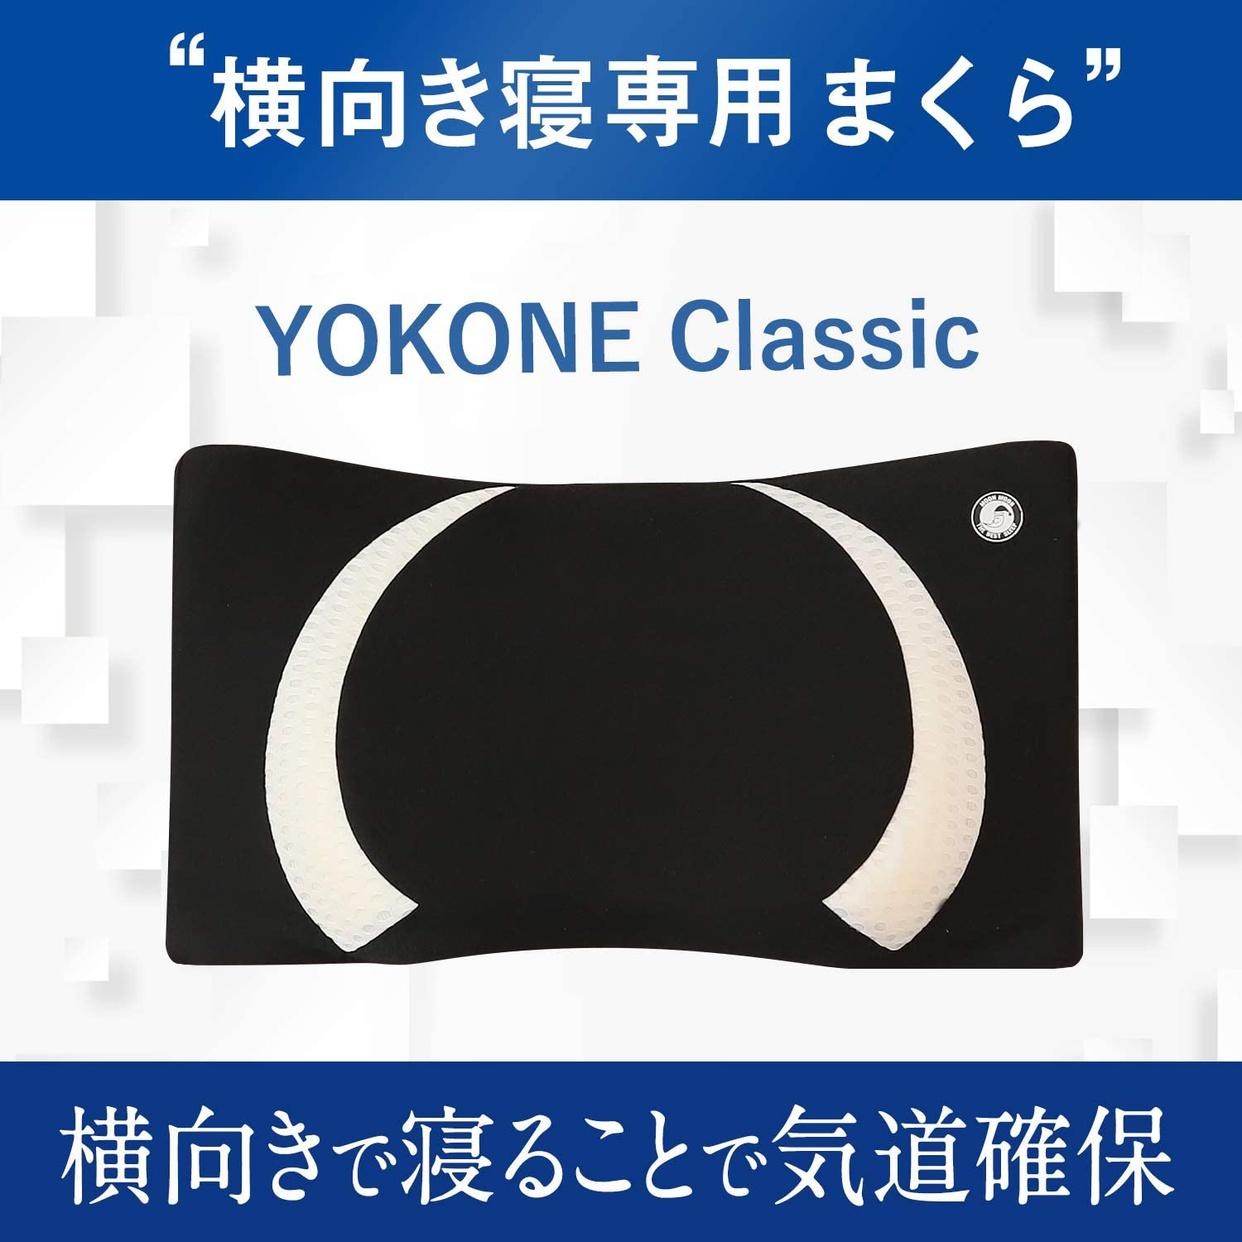 Moonmoon(ムーンムーン) YOKONE Classicの商品画像2